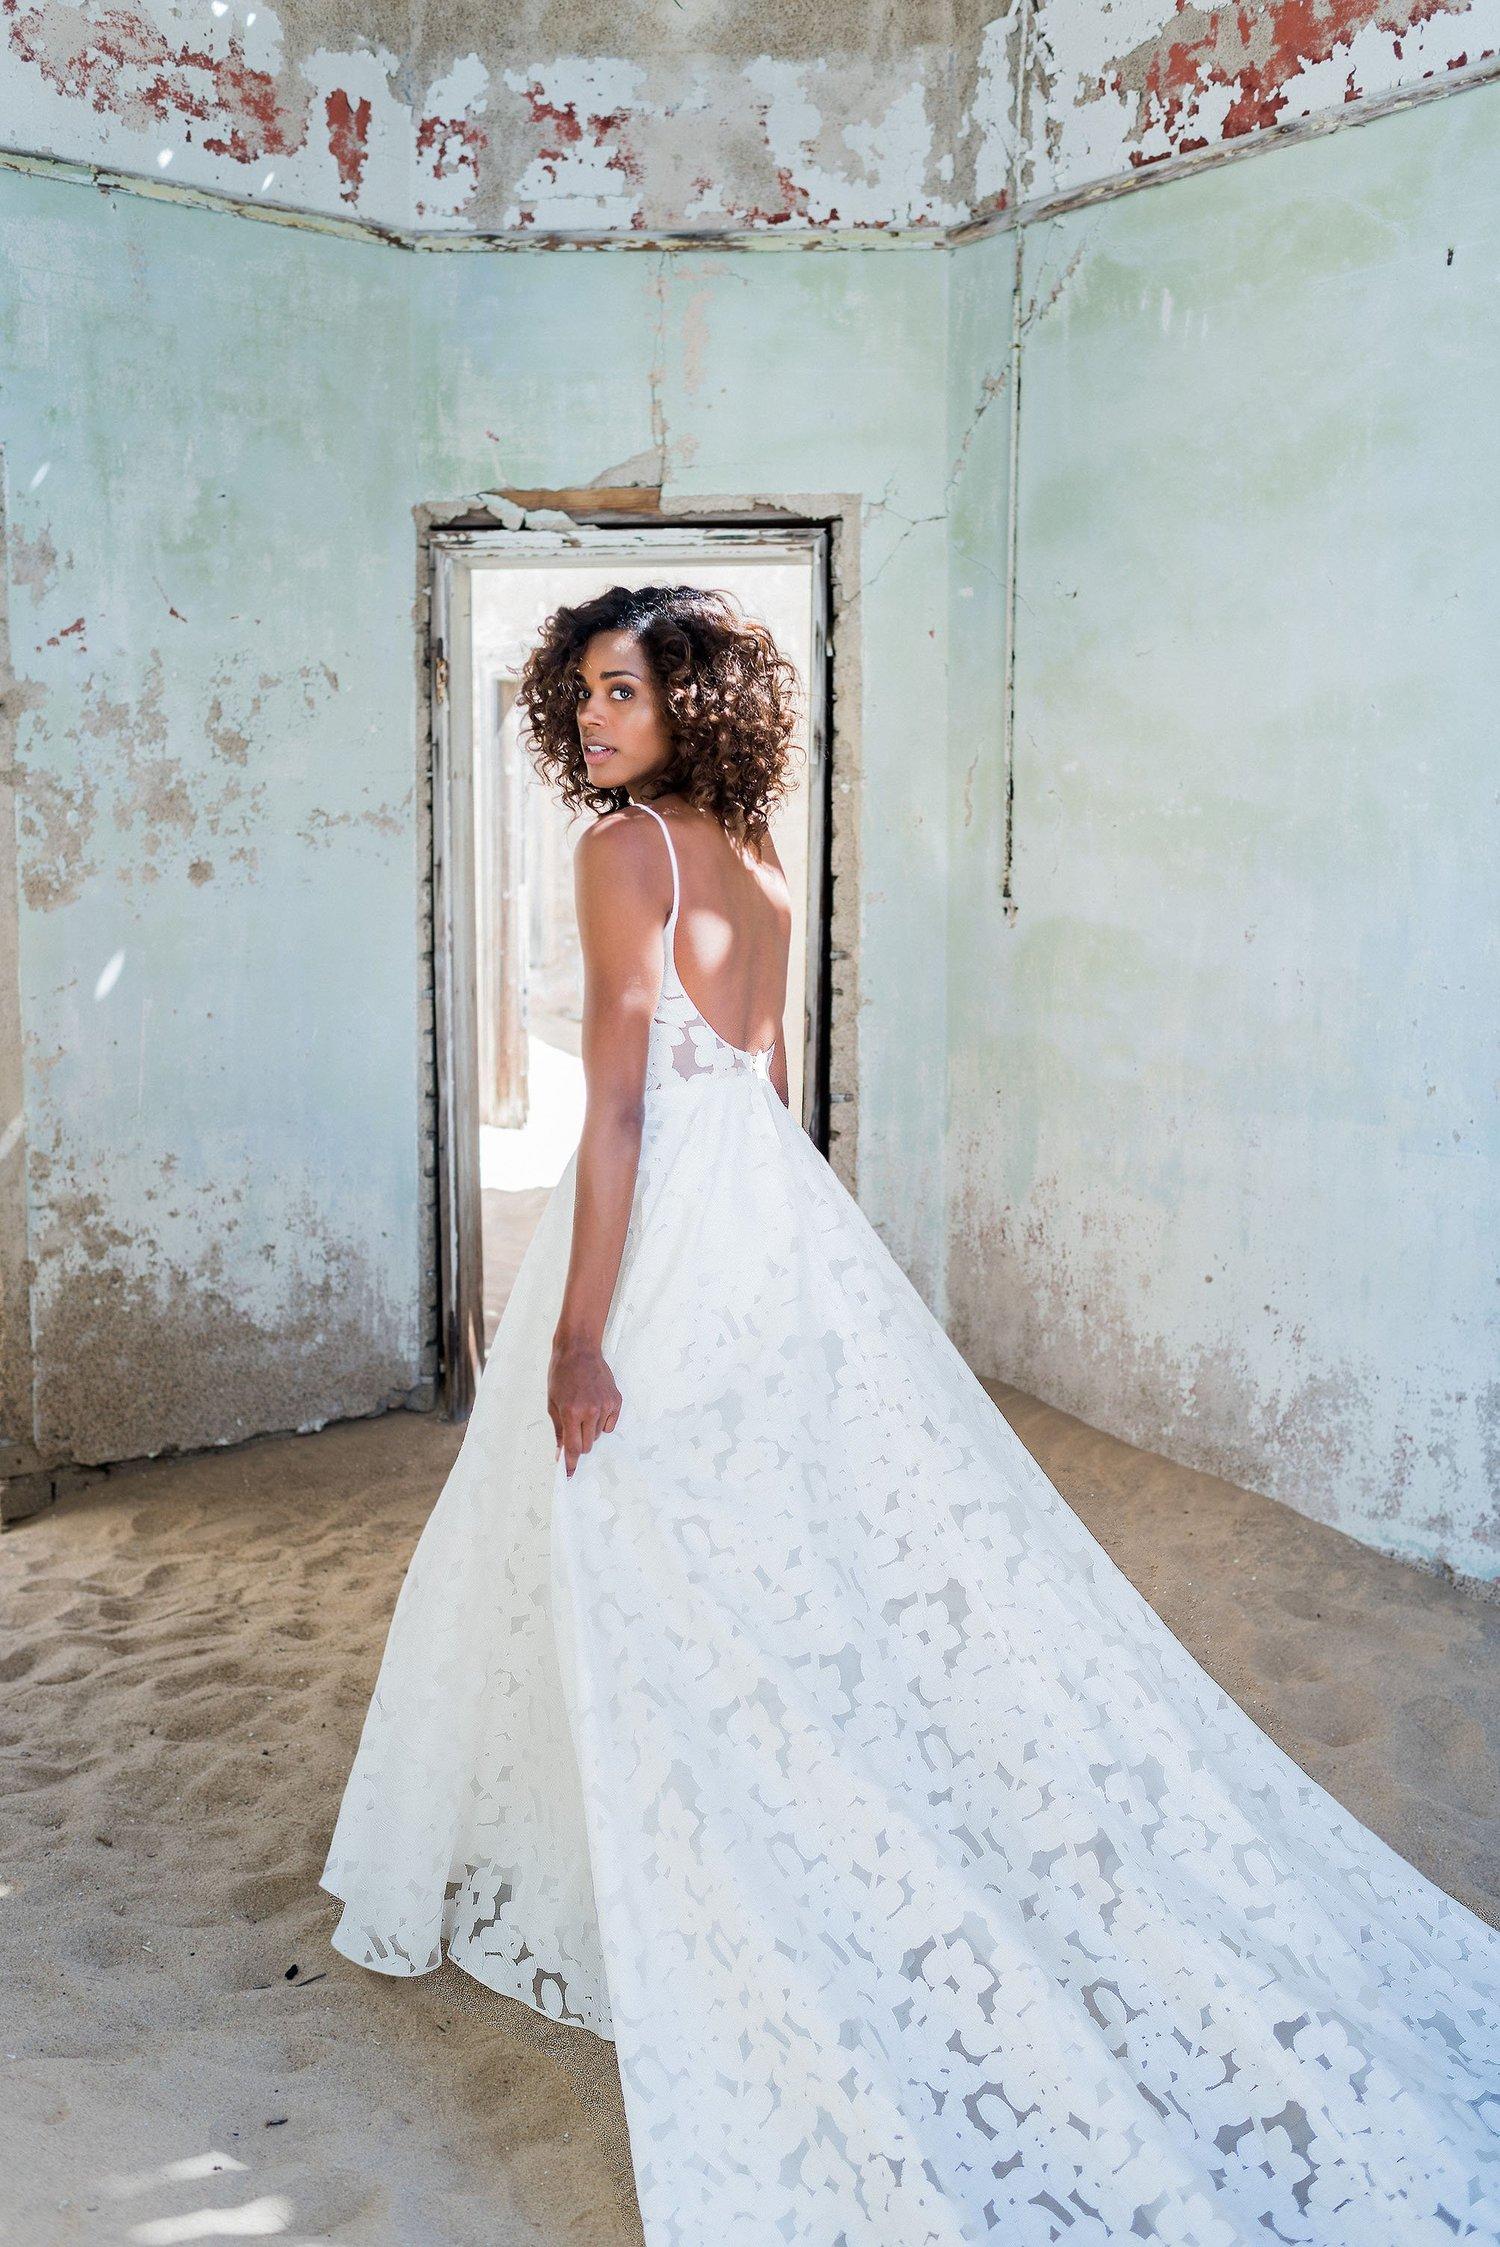 Truvelle 2020 Trunk Show Arc Bridal Omaha Nebraska,Homecoming Wedding Dresses In Sri Lanka